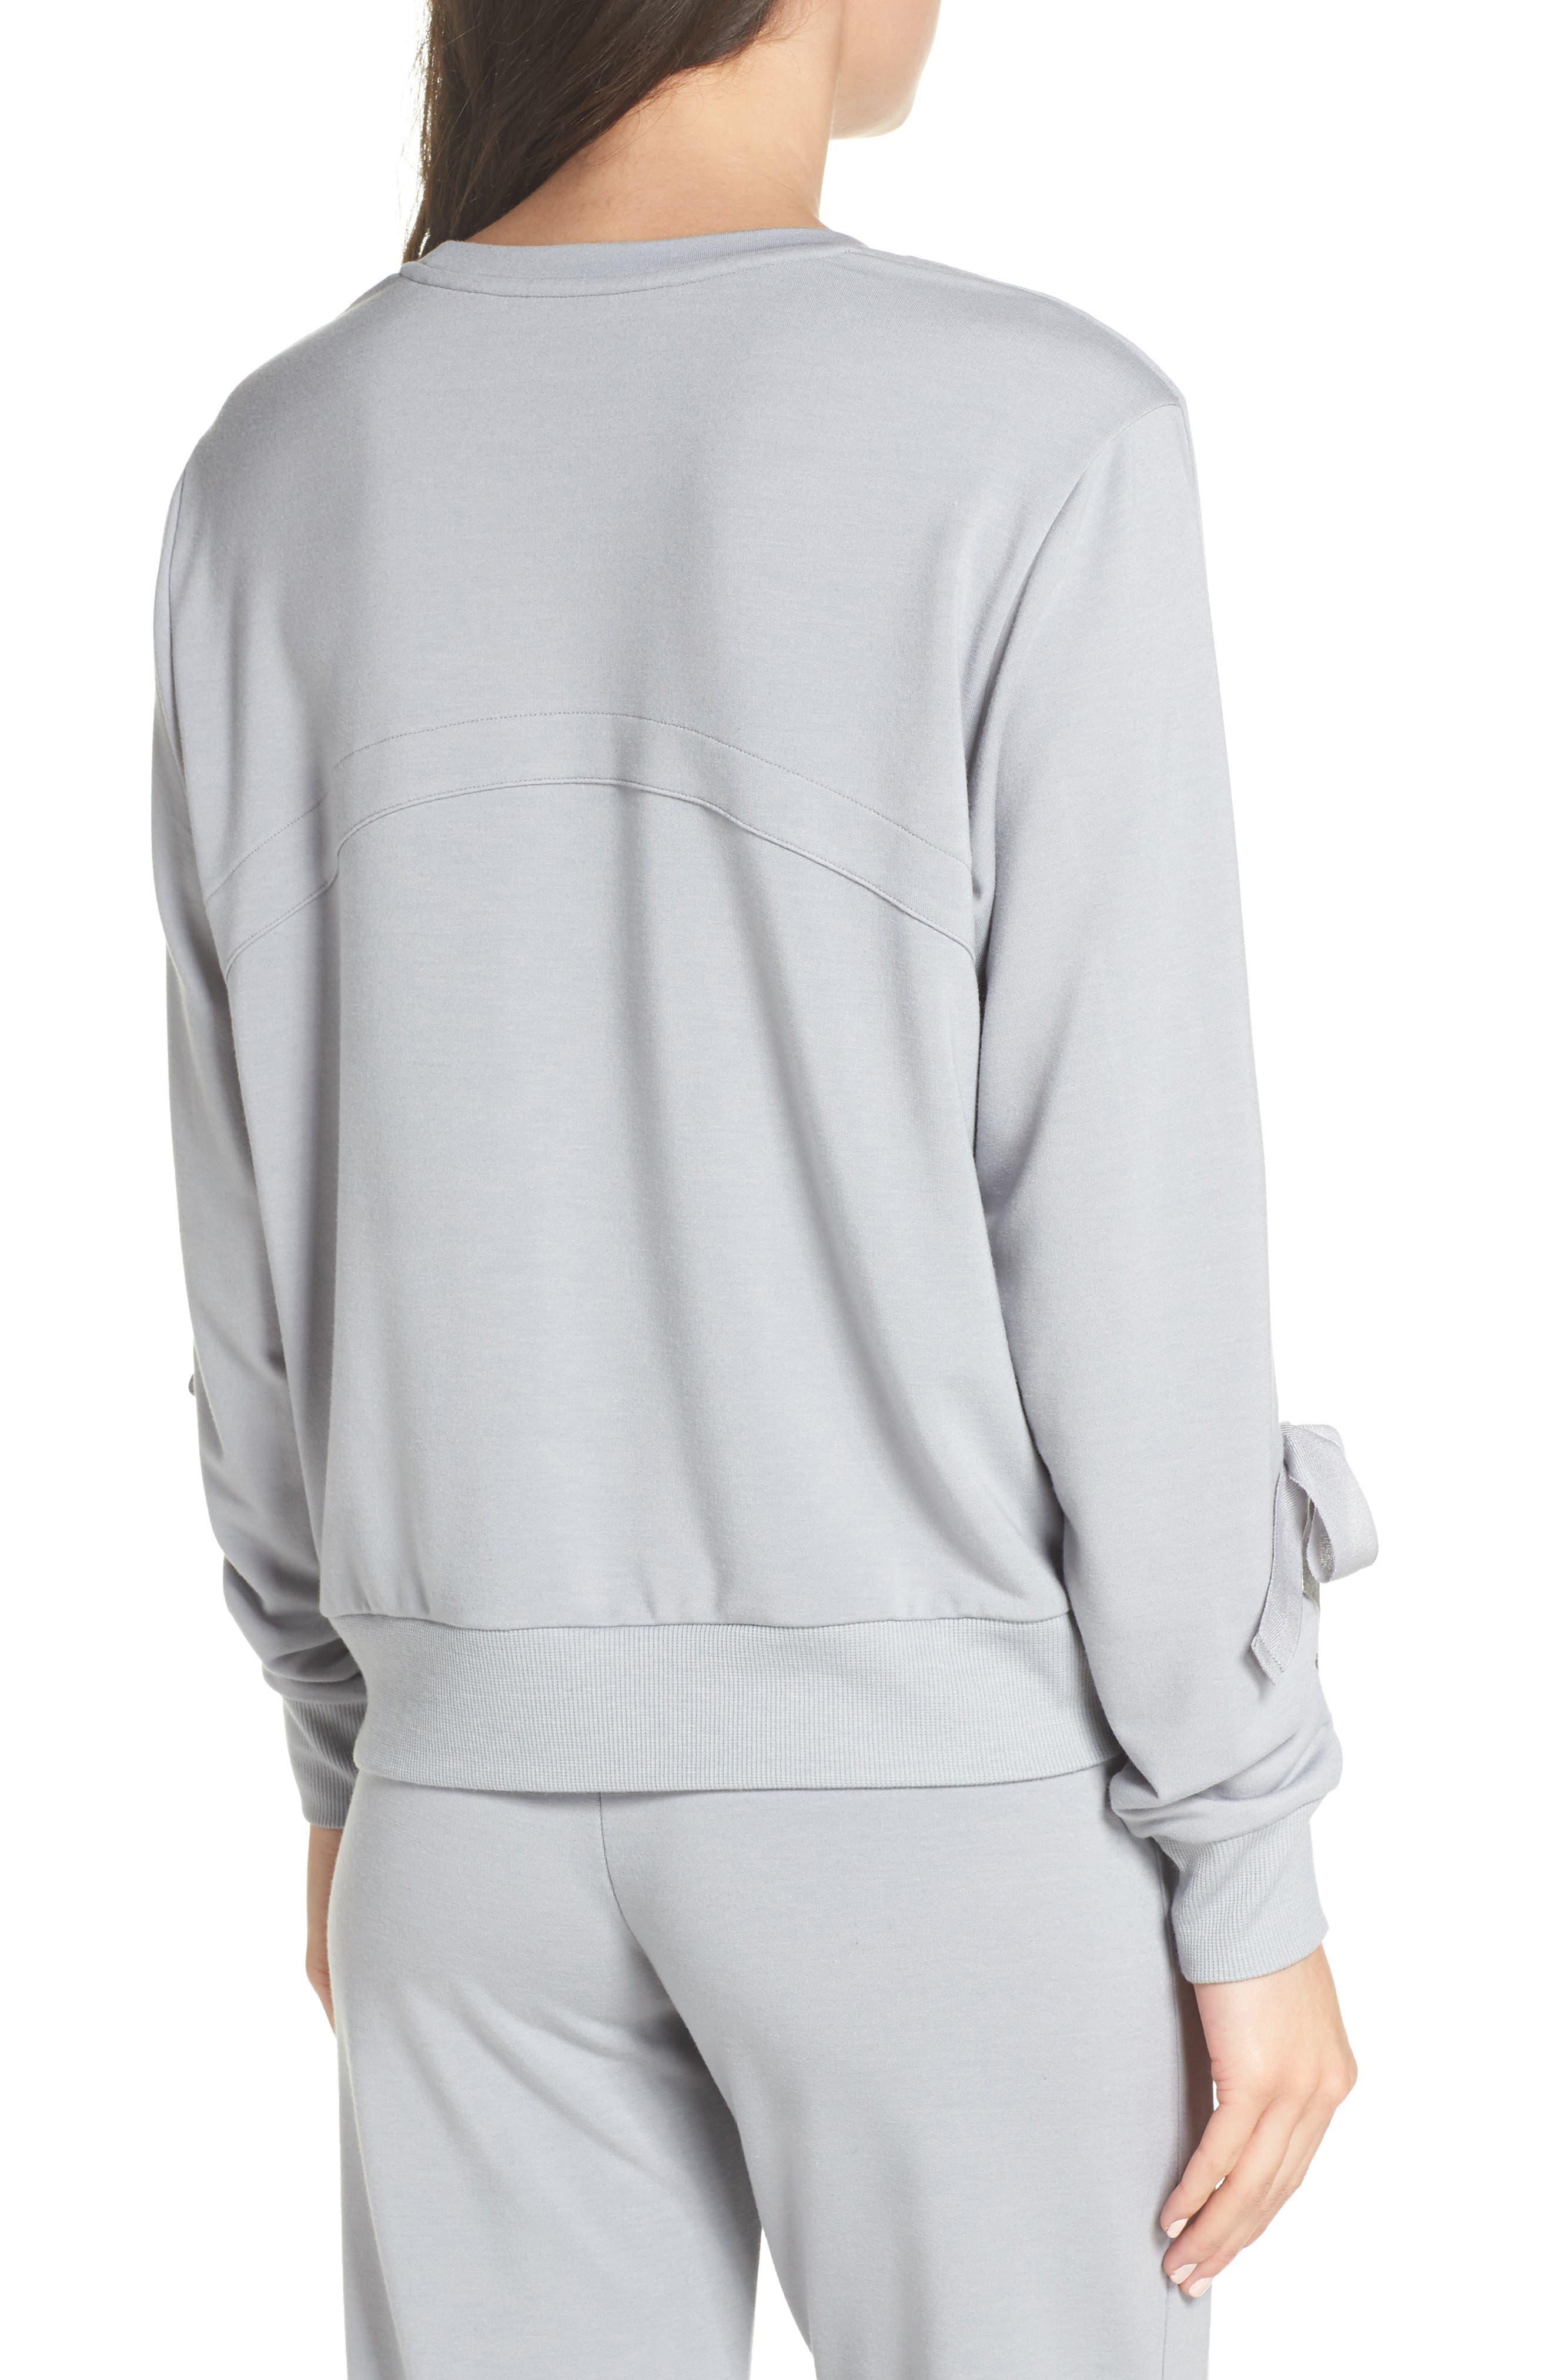 Gather Sleeve Sweatshirt,                             Alternate thumbnail 2, color,                             GREY WOLF